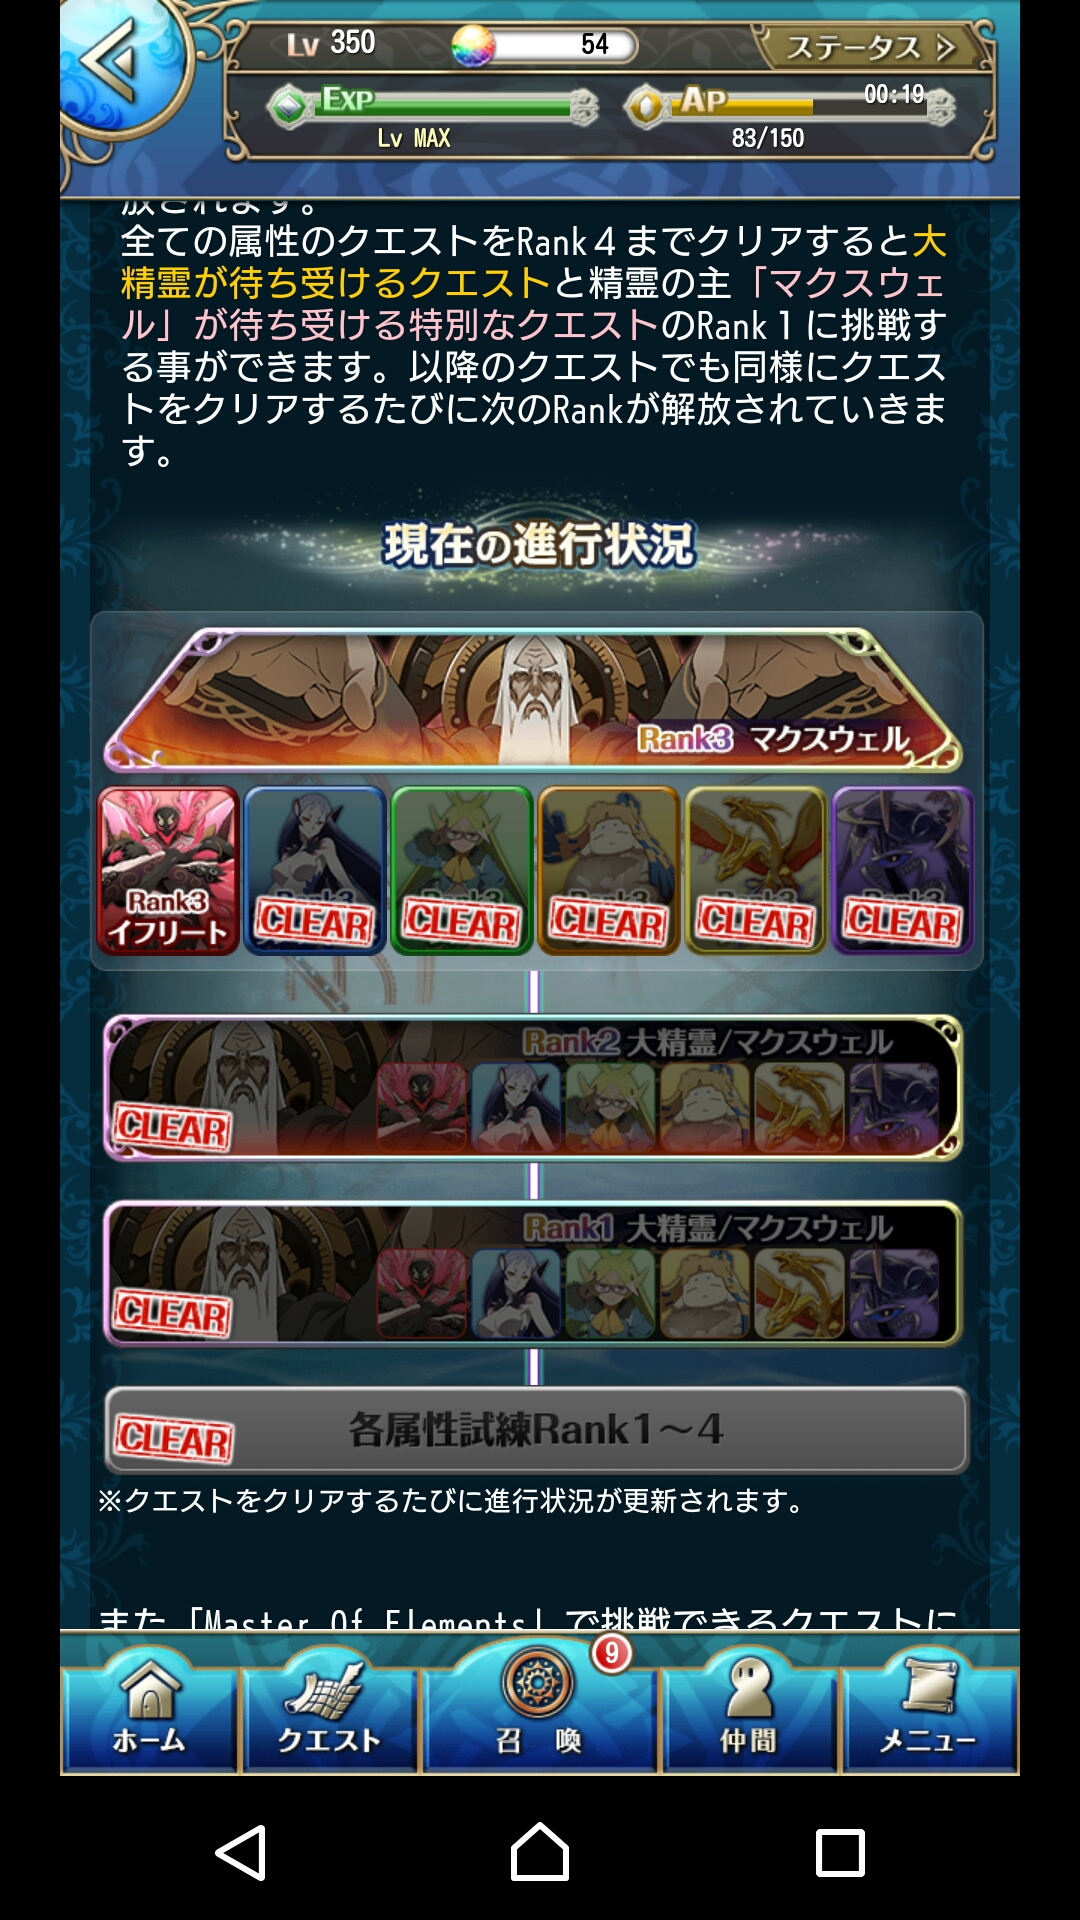 rank3現状